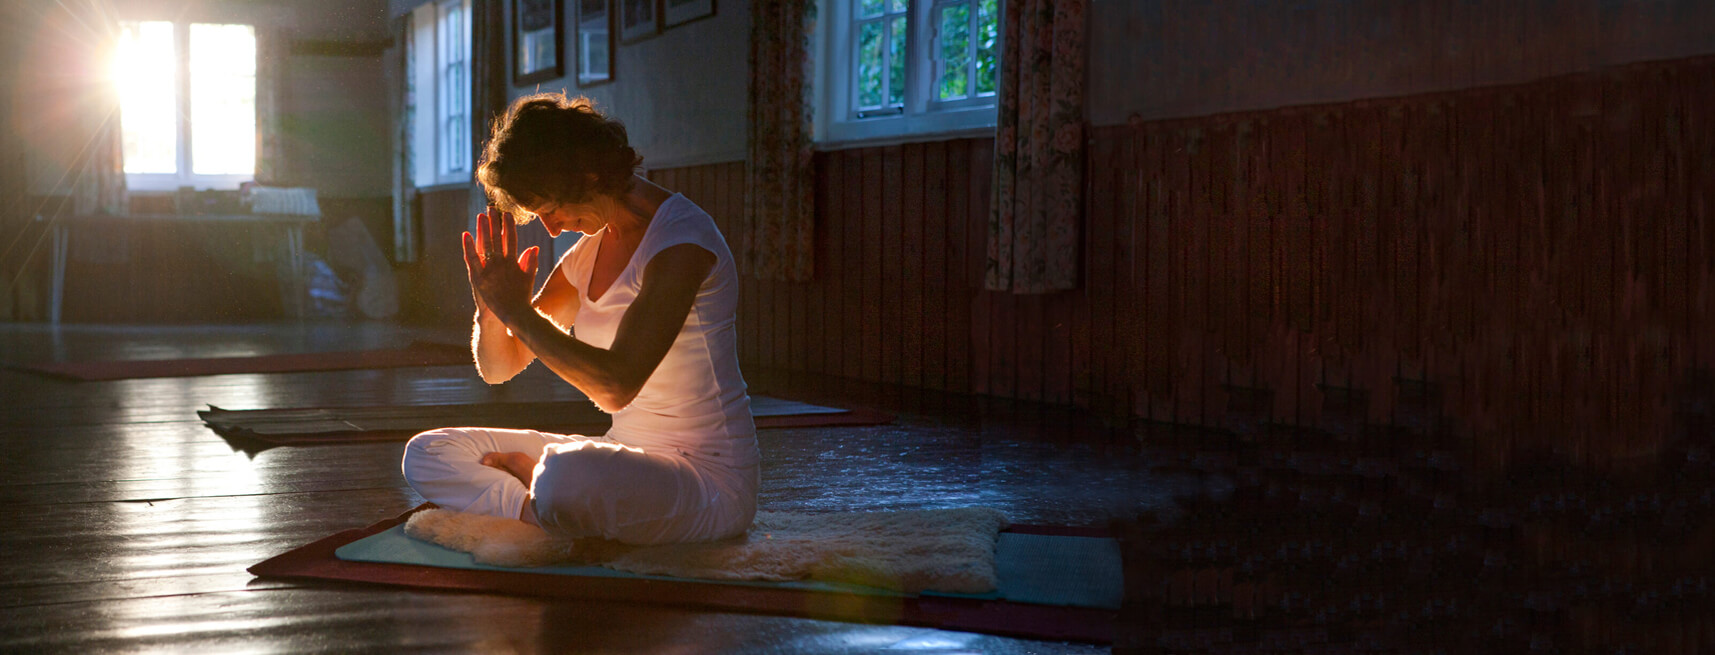 http://www.altaihealing.com/wp-content/uploads/2016/06/Yoga-Opener-no_txt.jpg